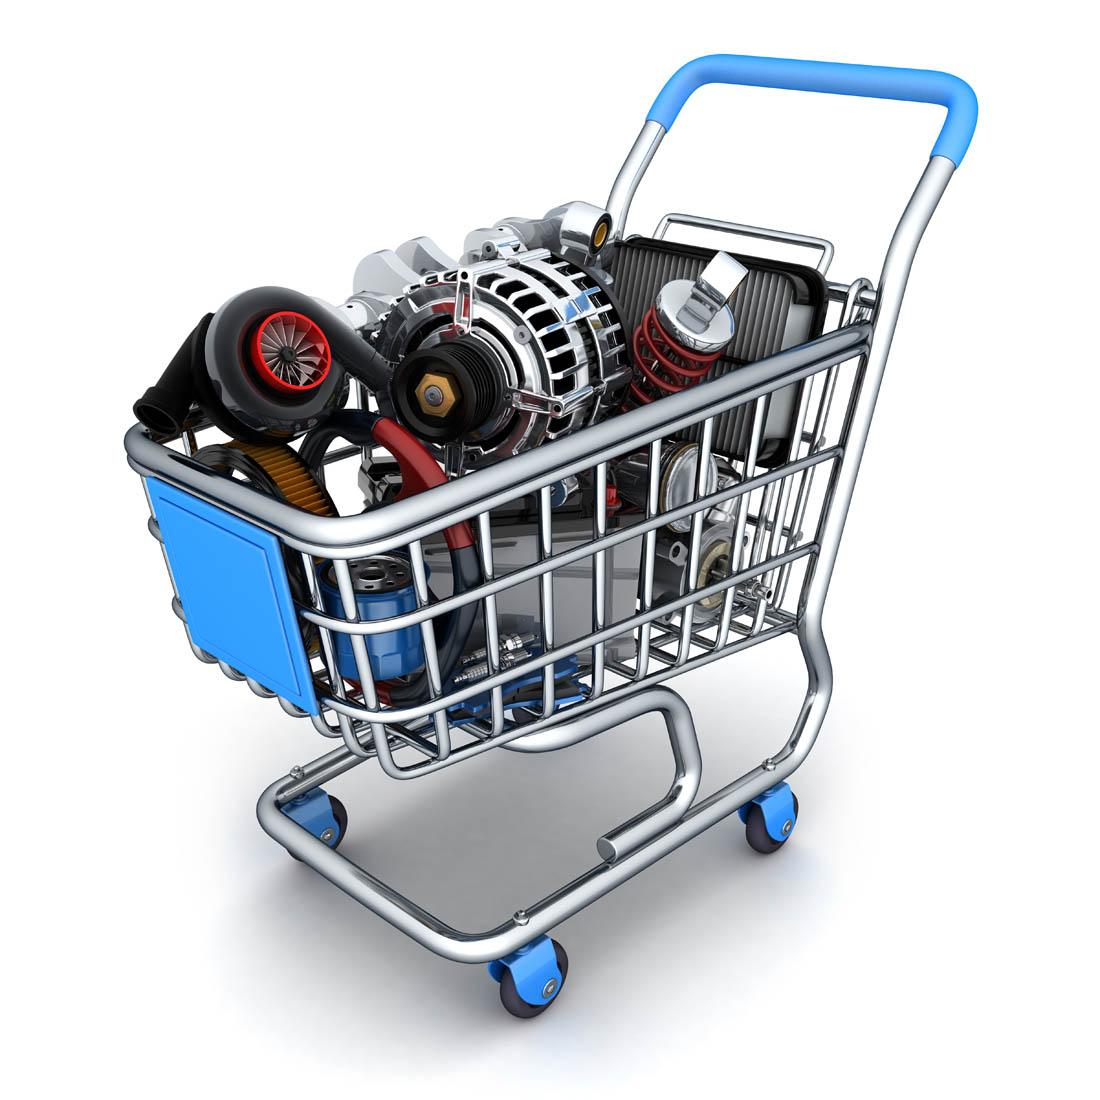 HappyWeb.ro | Web development | Auto Parts Shop using TecDoc | Web design, web development, online marketing